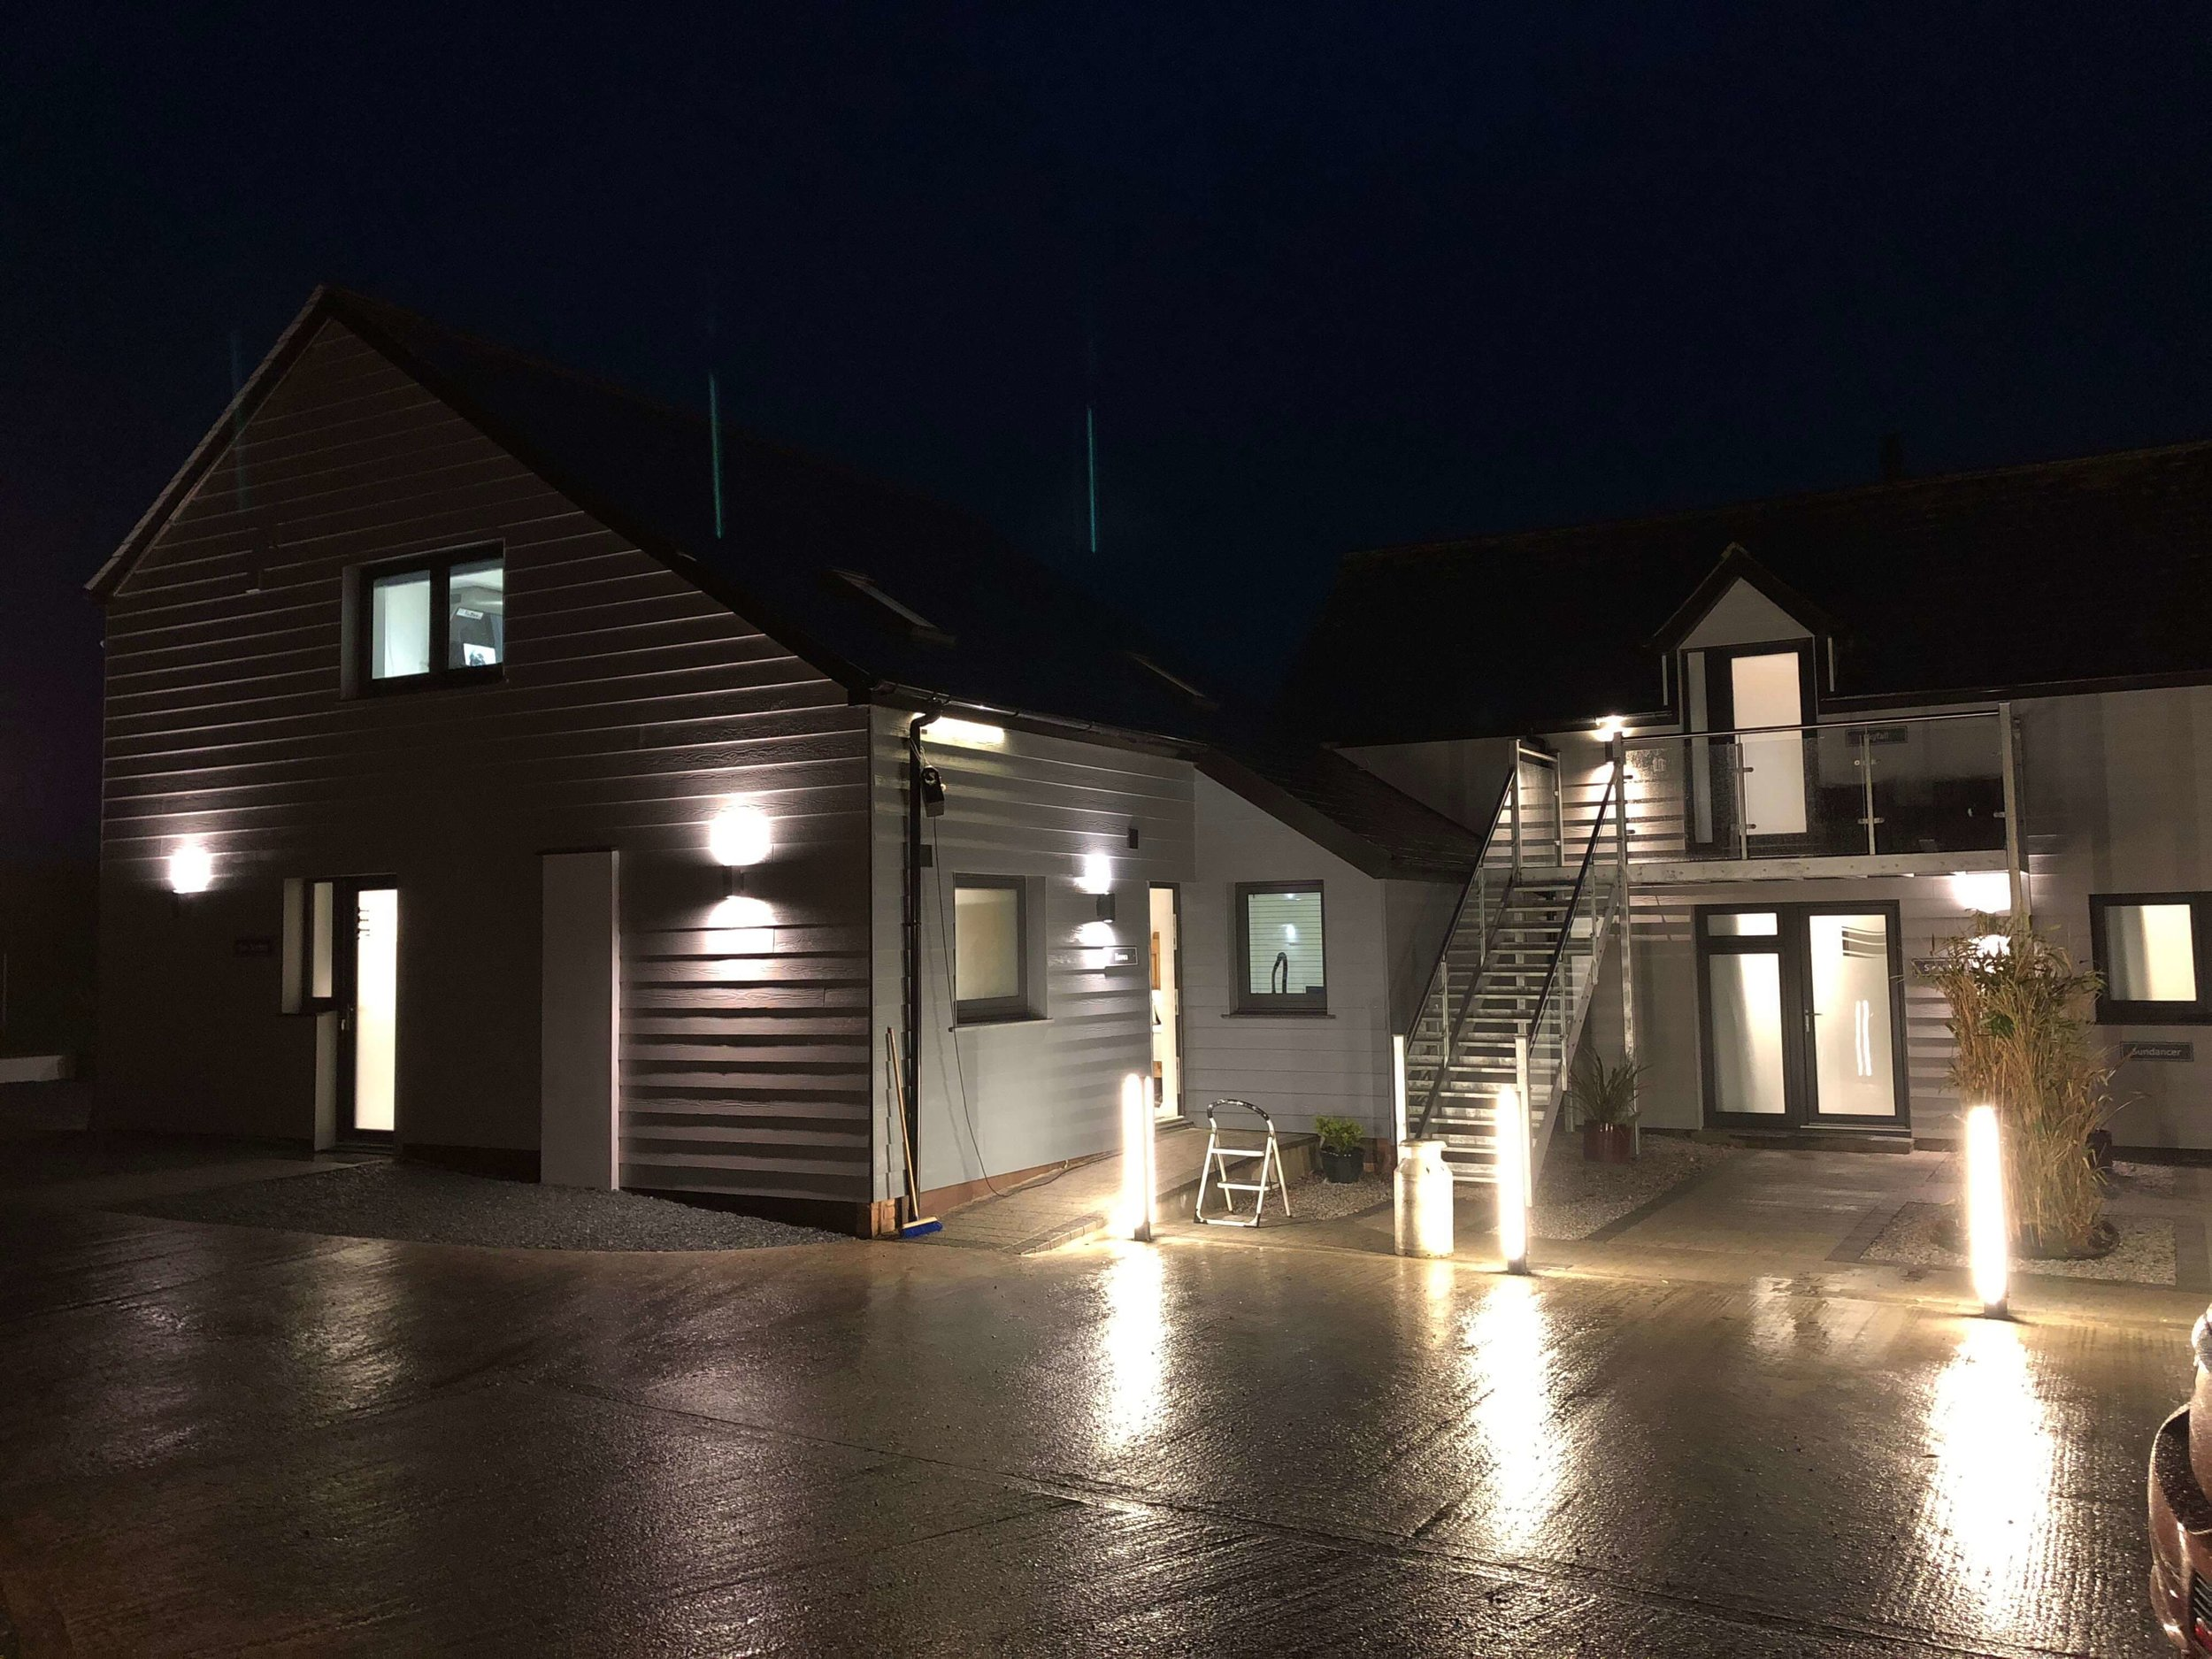 courtyard-night-lighting.jpg